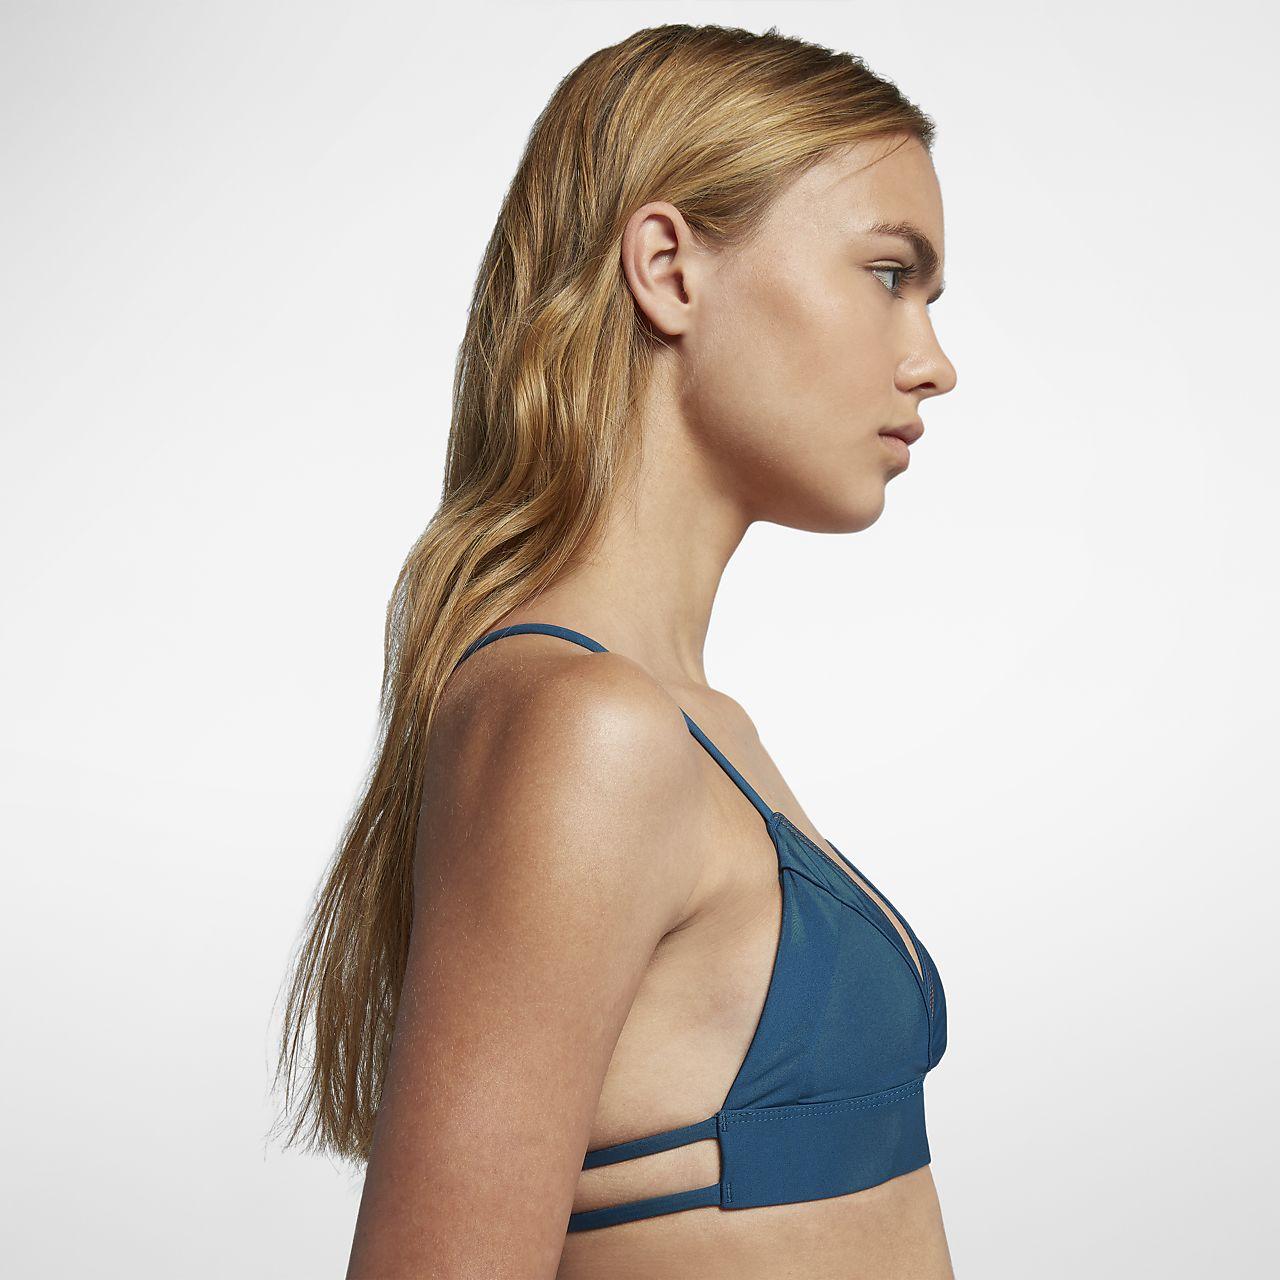 e8edda670a Hurley Quick Dry Bralette Women s Surf Top. Nike.com